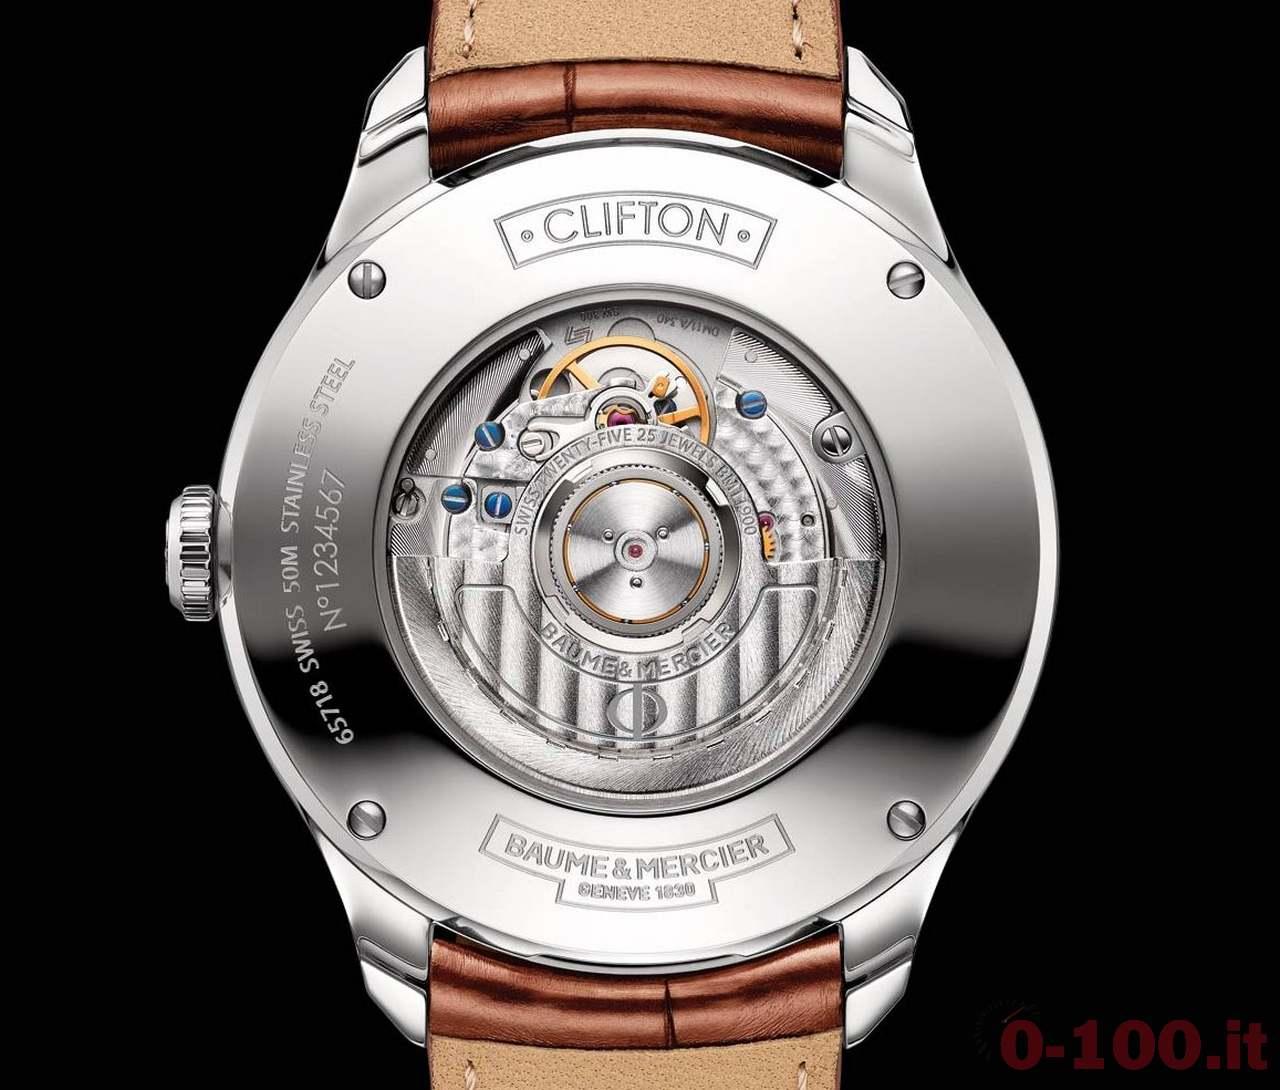 baume-et-mercier-clifton-complete-calendar-ref-10213-prezzo-price_0-1003